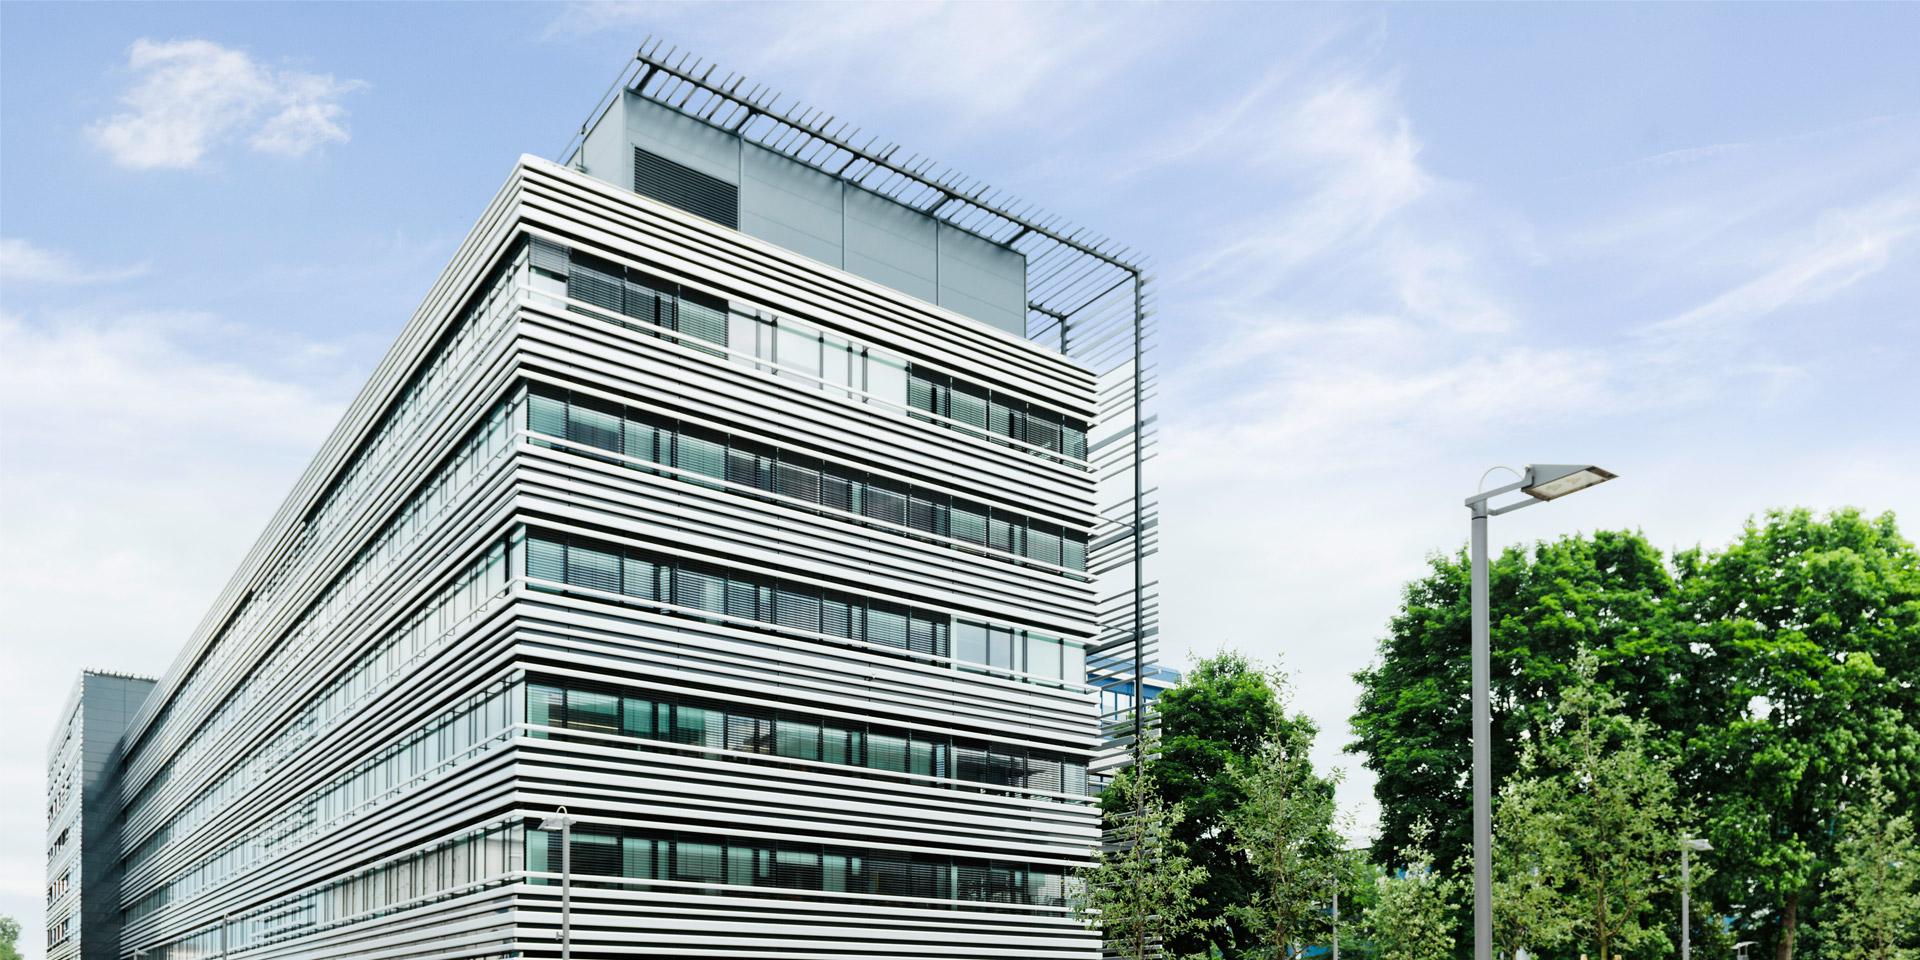 Fassadenlamellen am Rohde & Schwarz Technologiezentrum II in München